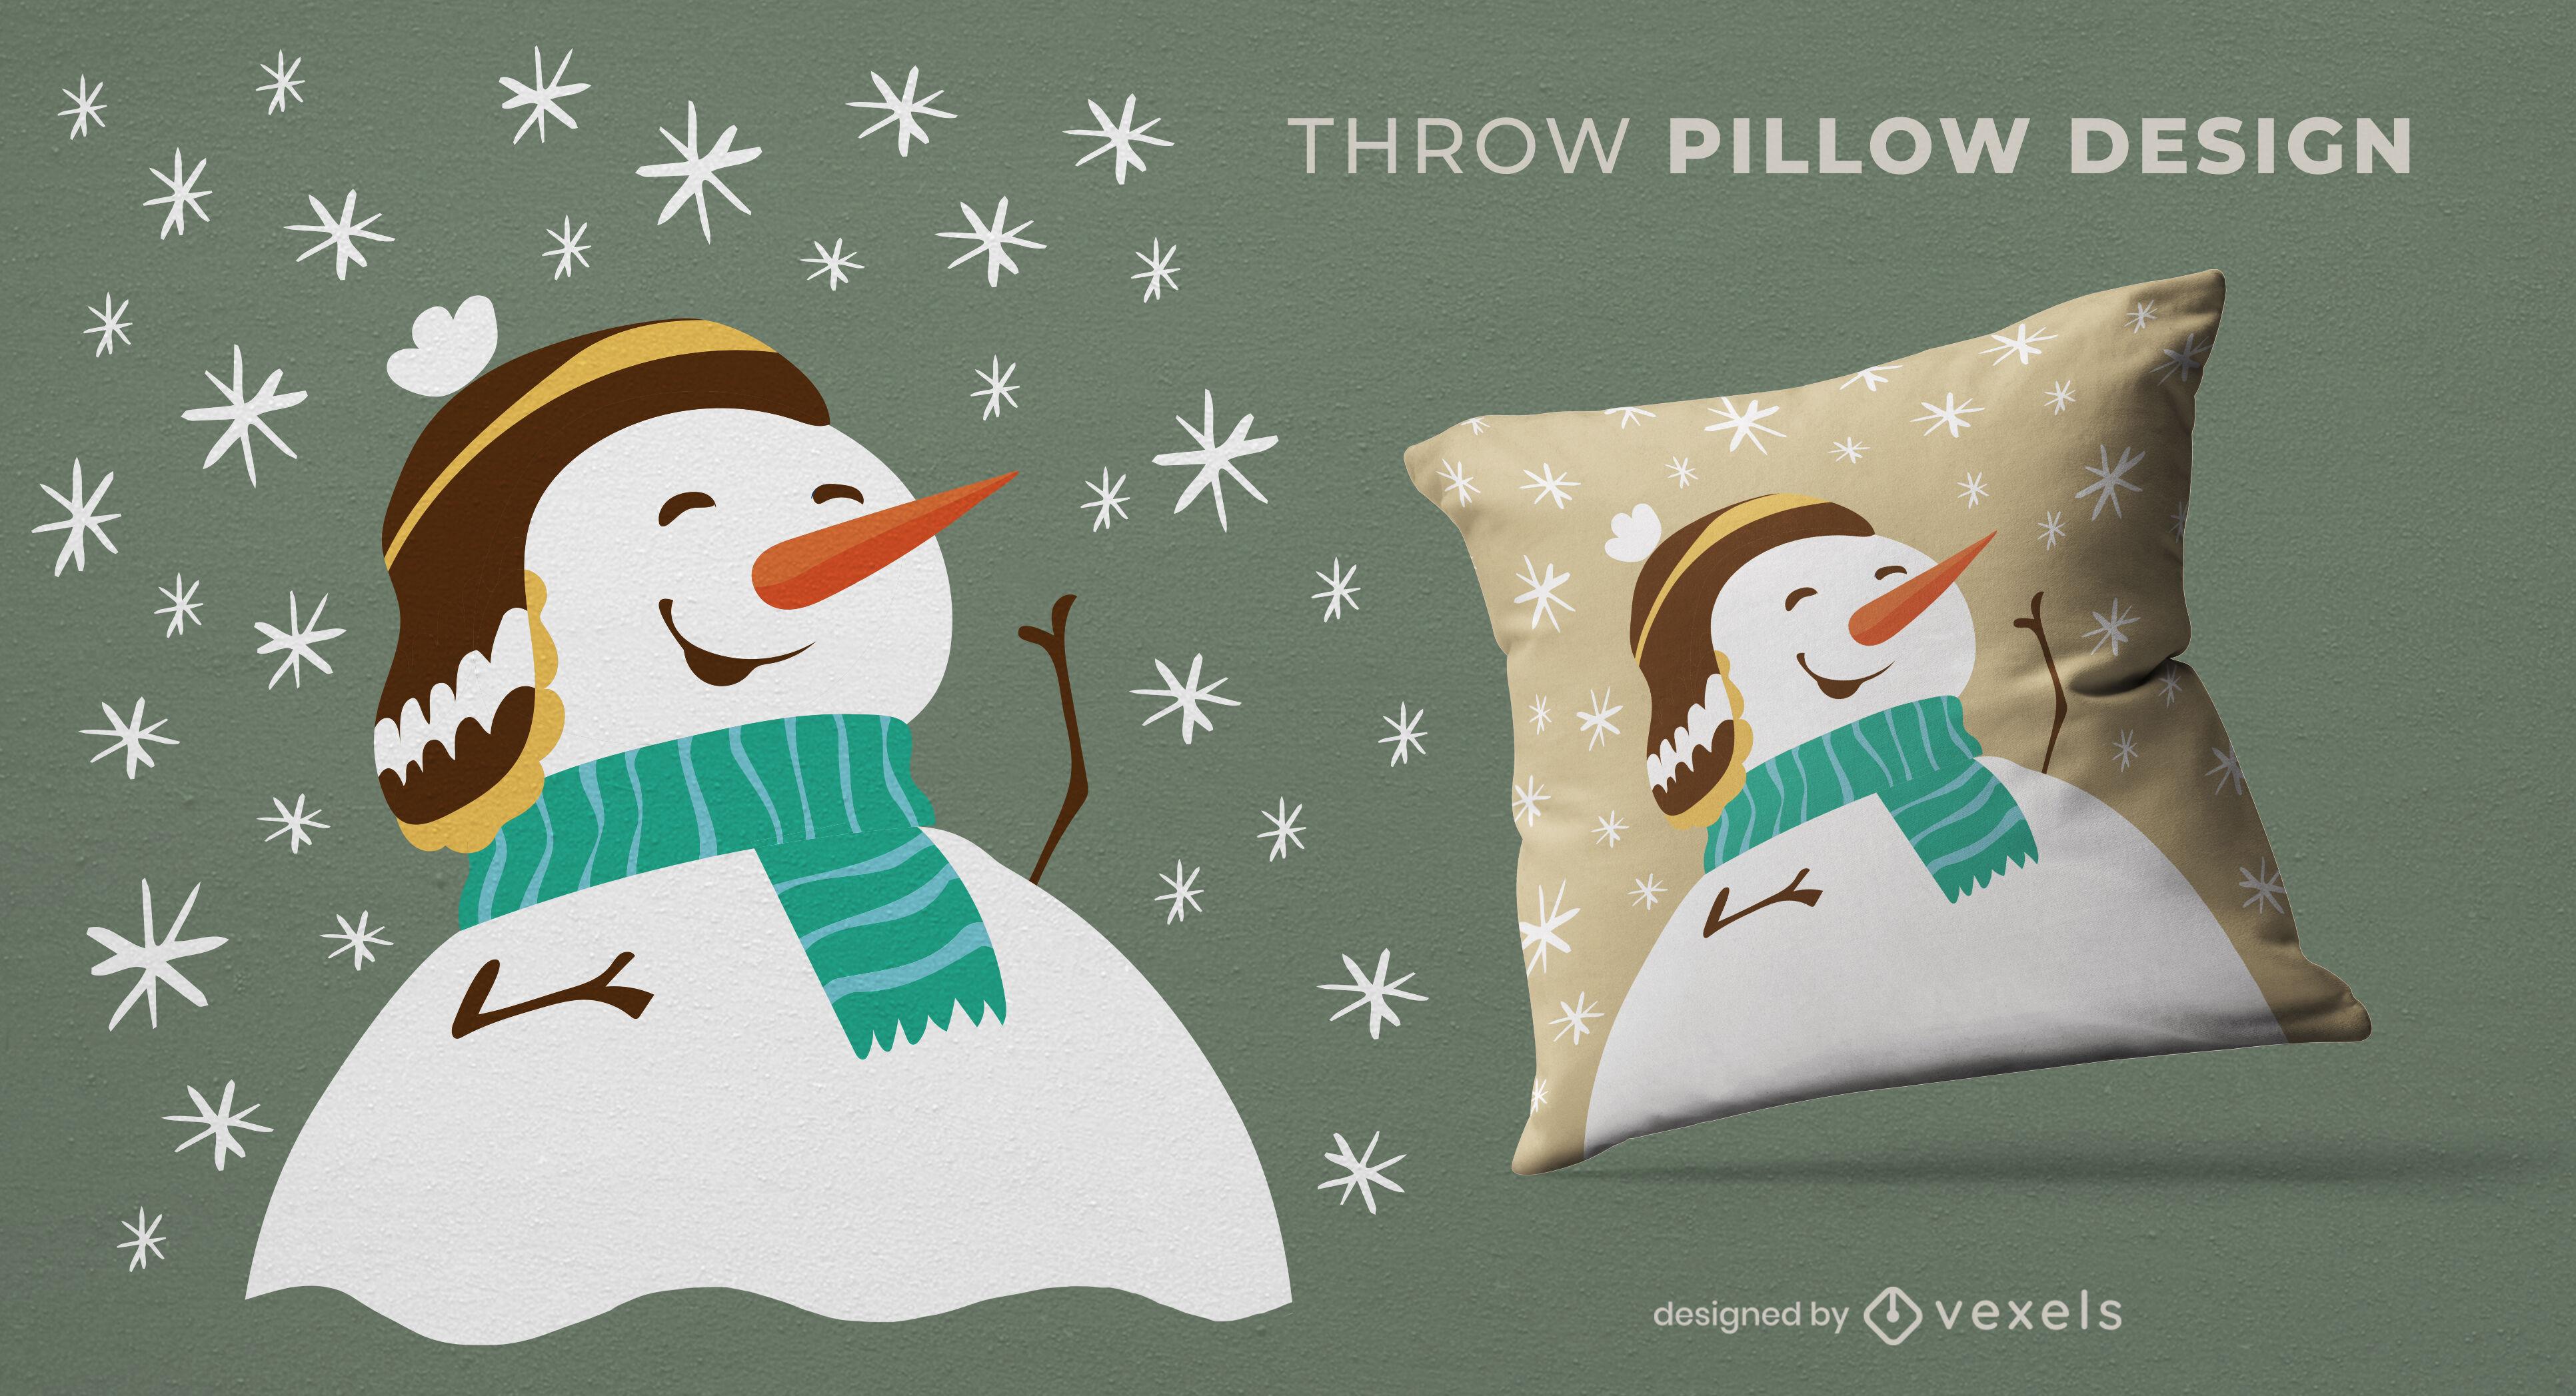 Diseño de almohada de tiro navideño de muñeco de nieve